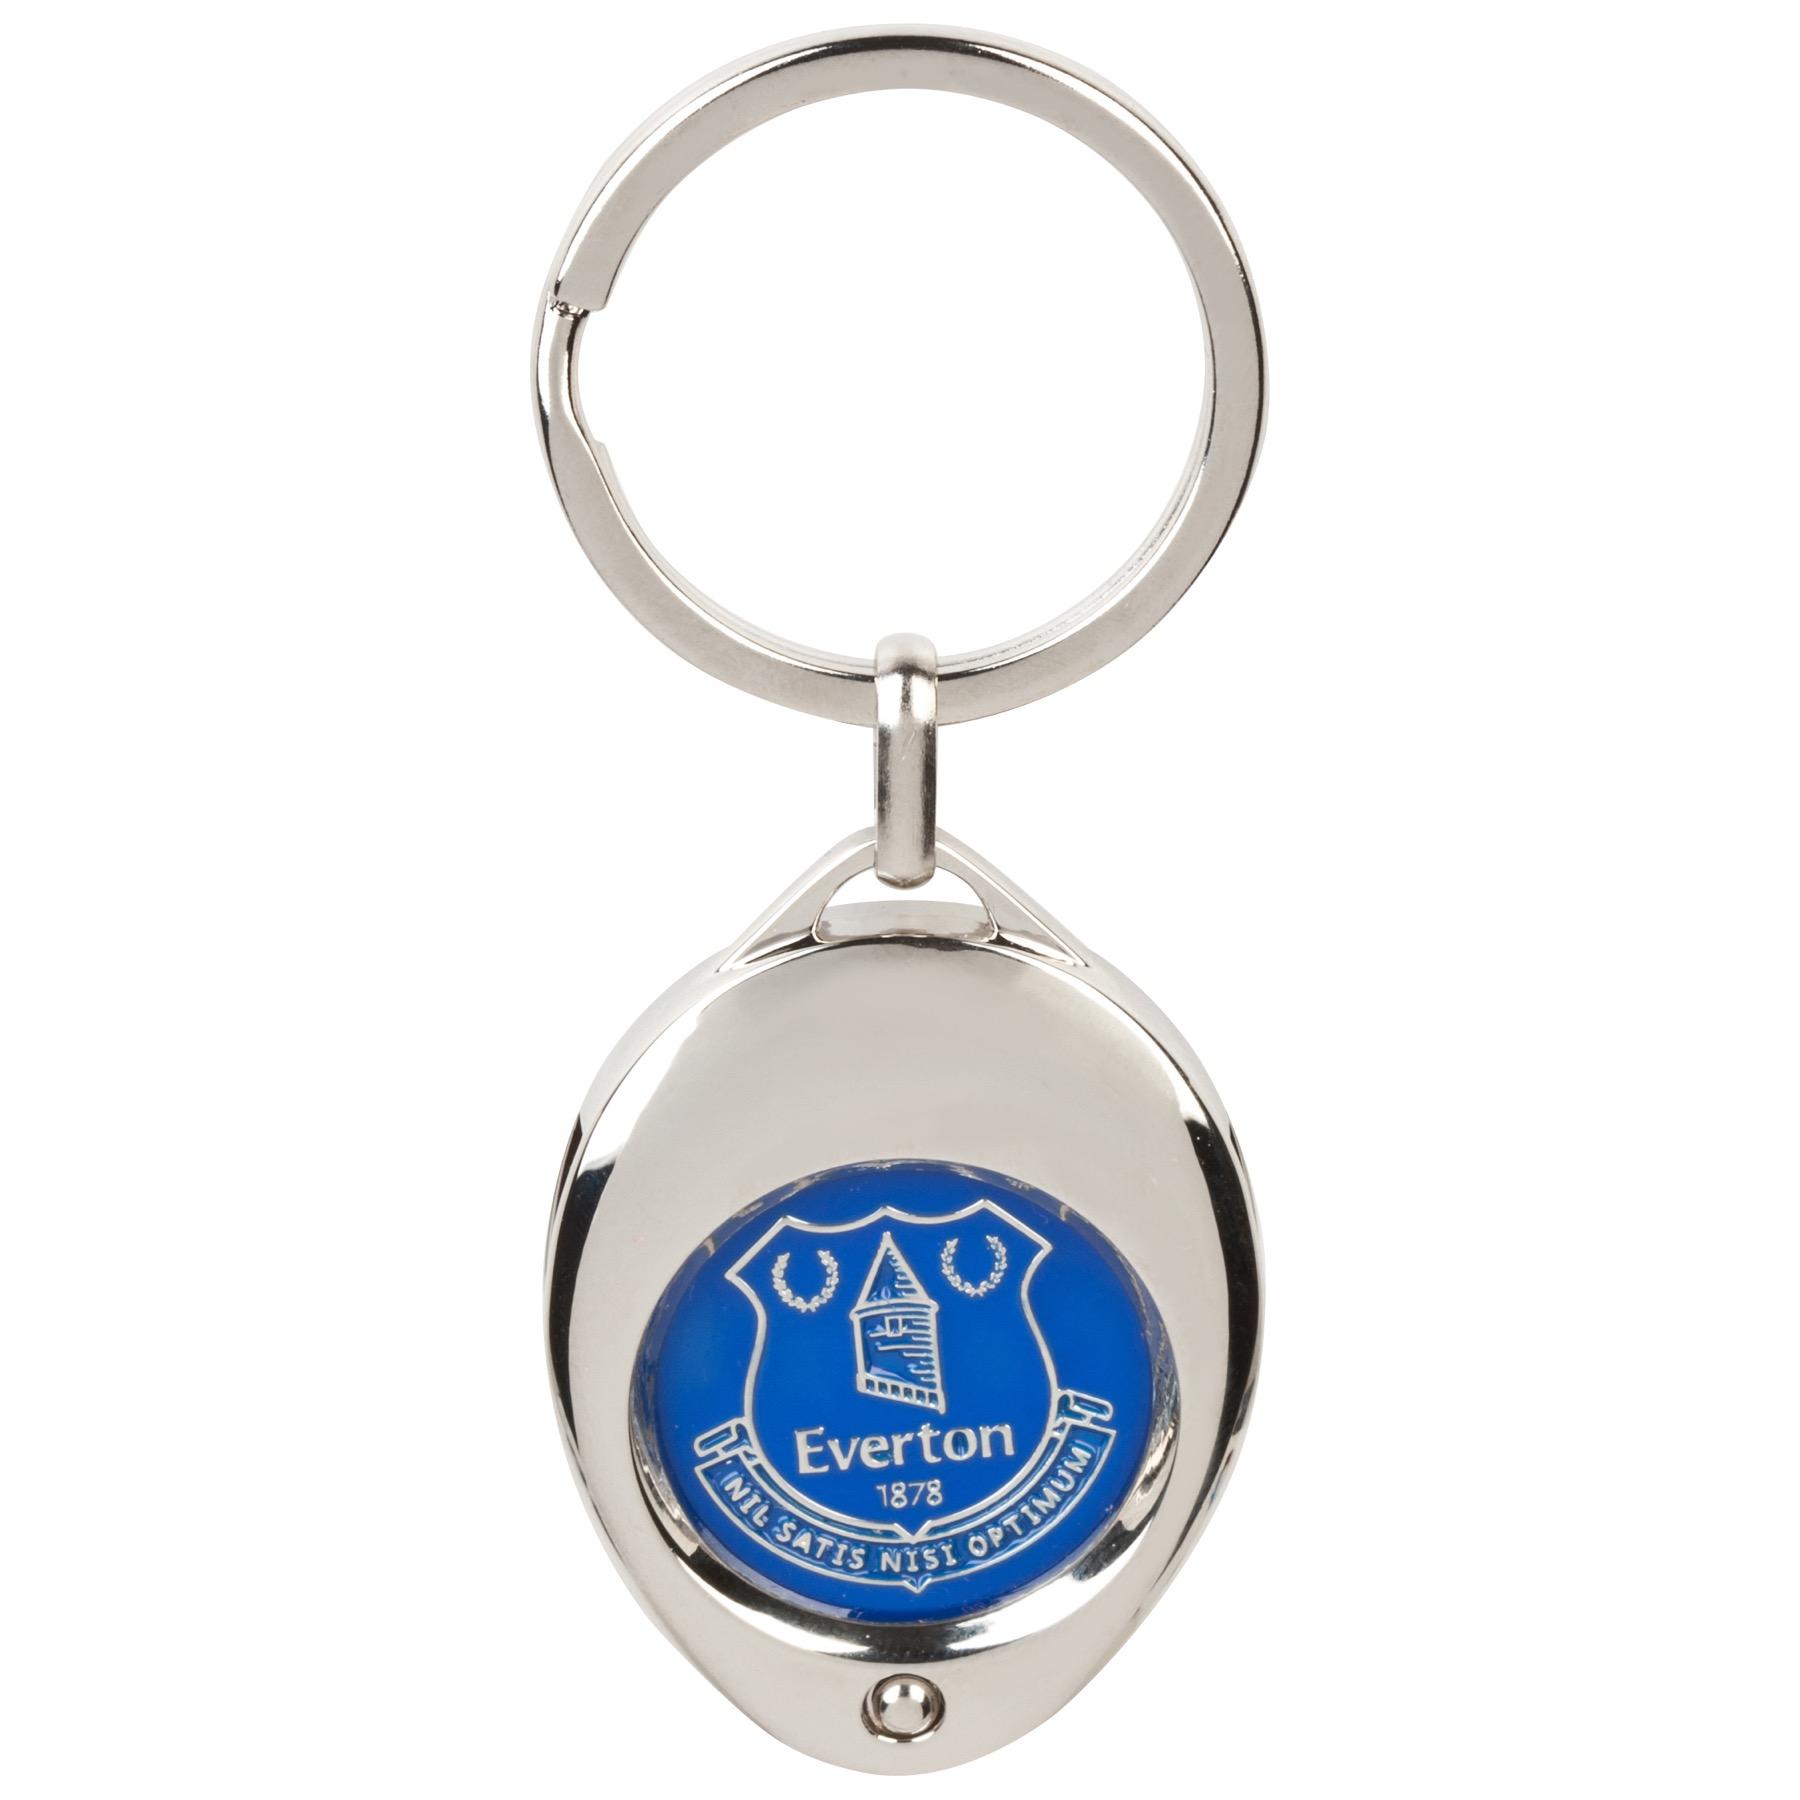 Everton Trolley Coin Keyring